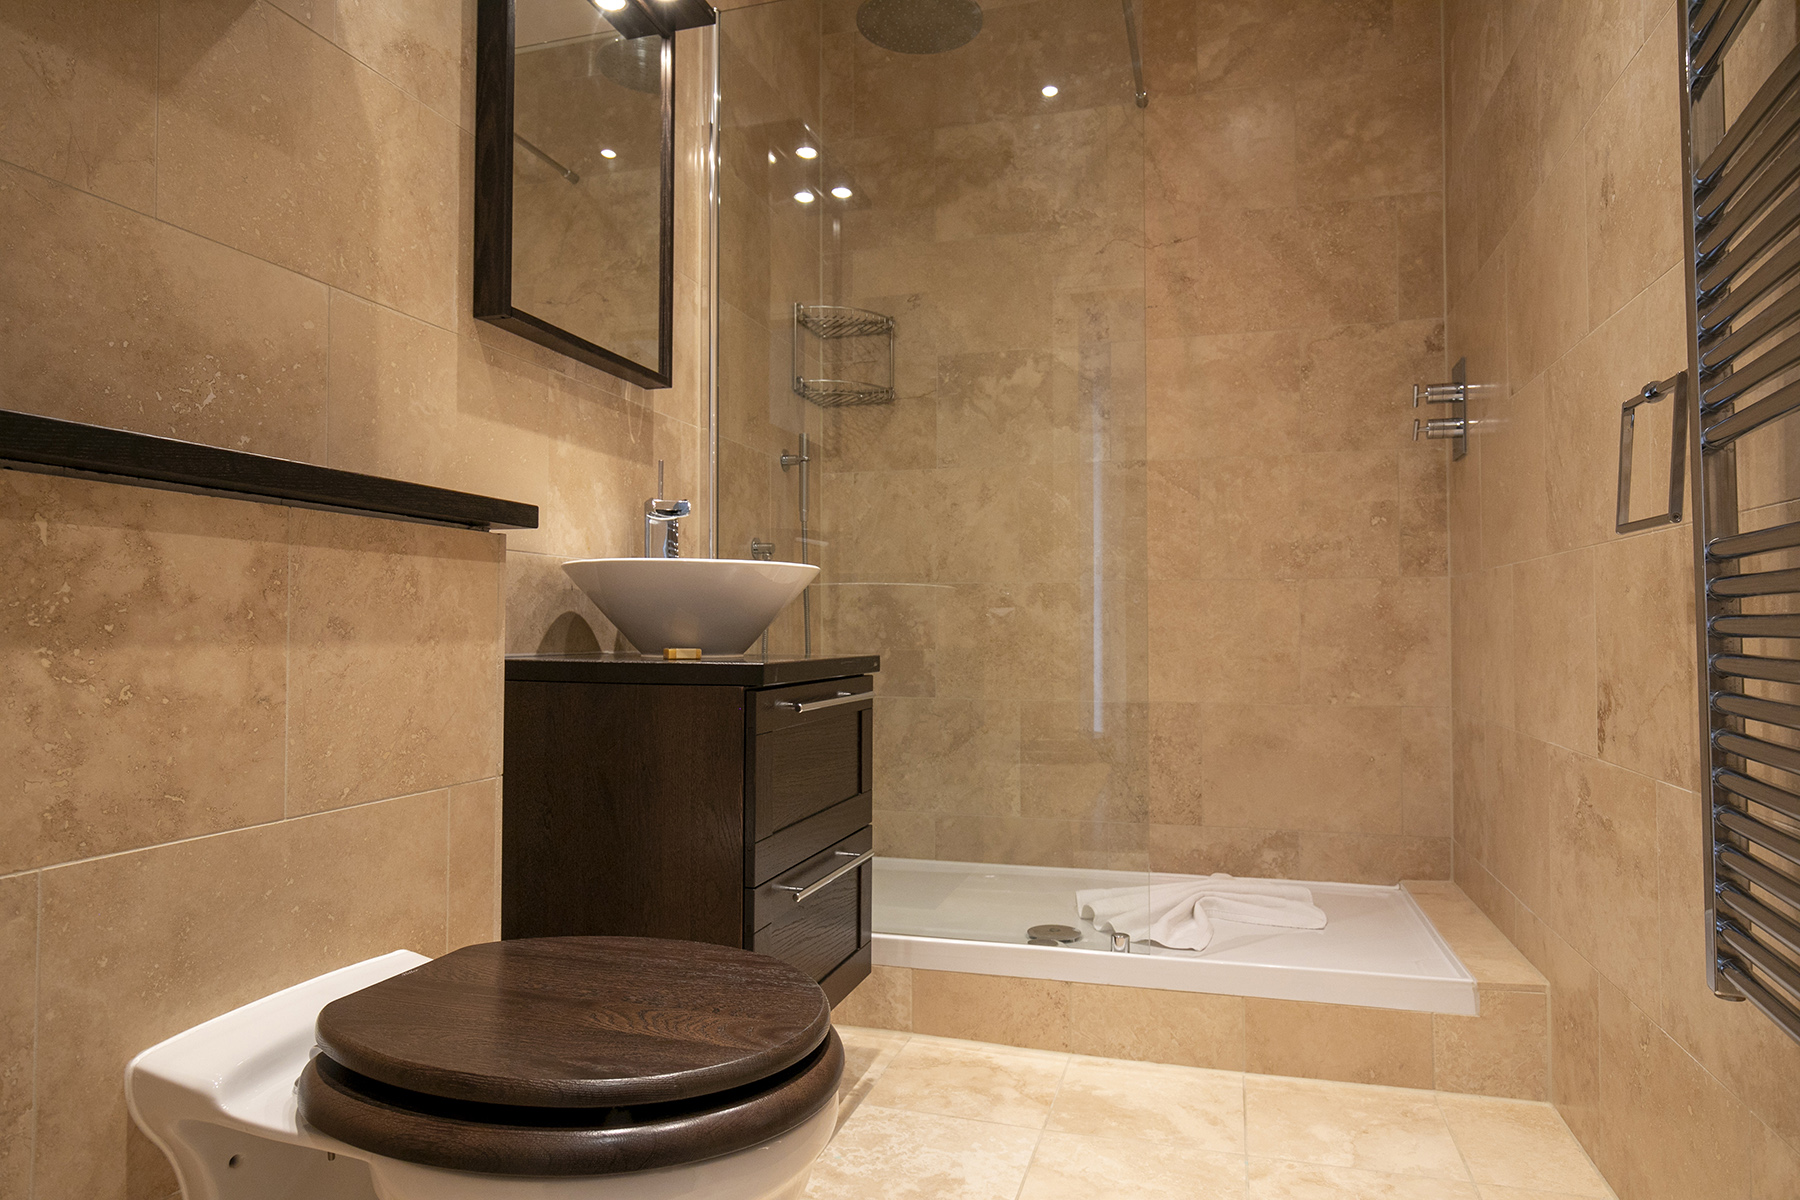 Shower at Wallis Square Apartments, Centre, Farnborough - Citybase Apartments